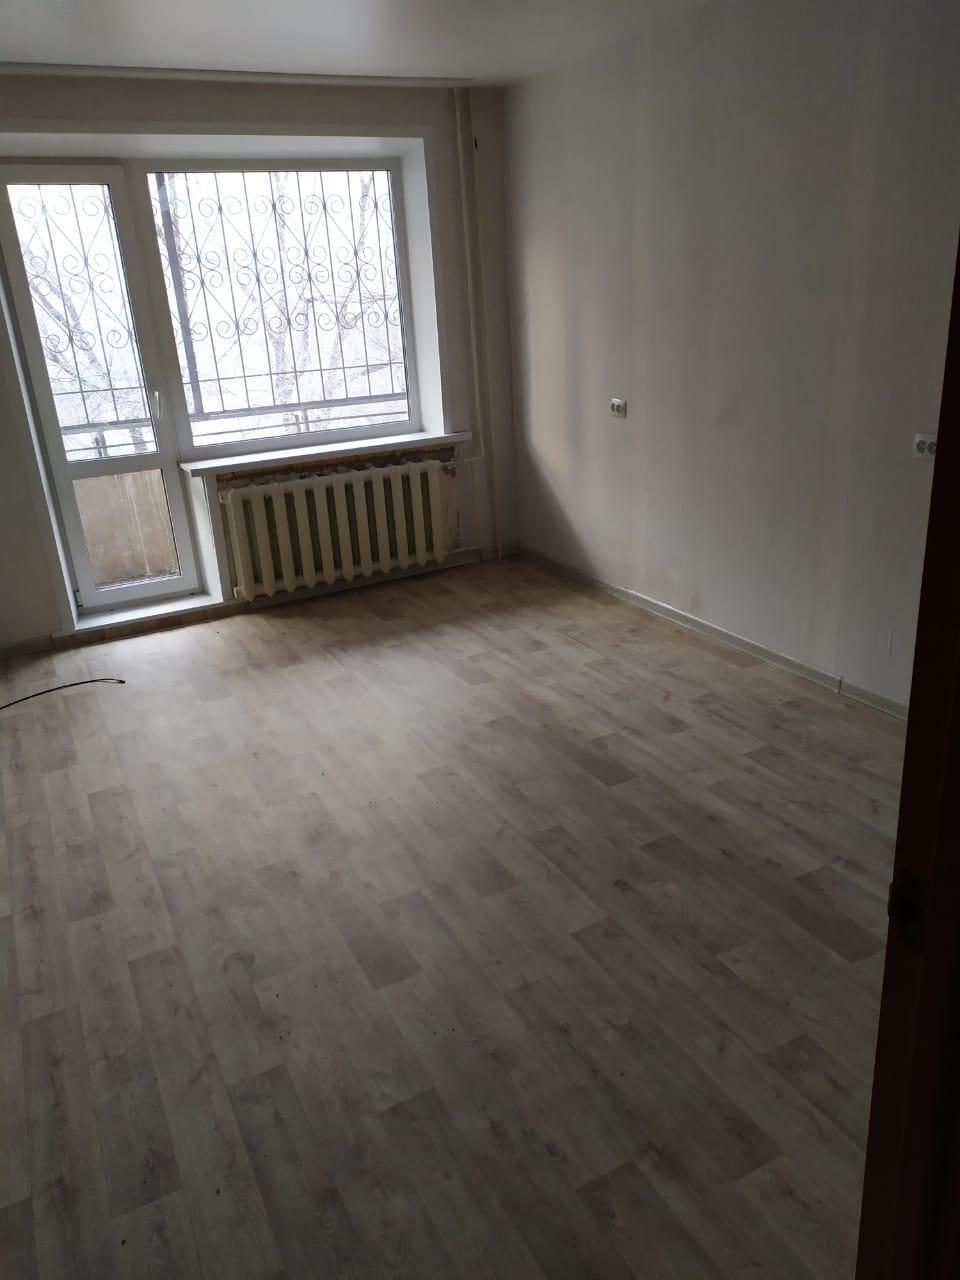 3к квартира улица Гастелло, 32 | 16000 | аренда в Красноярске фото 1